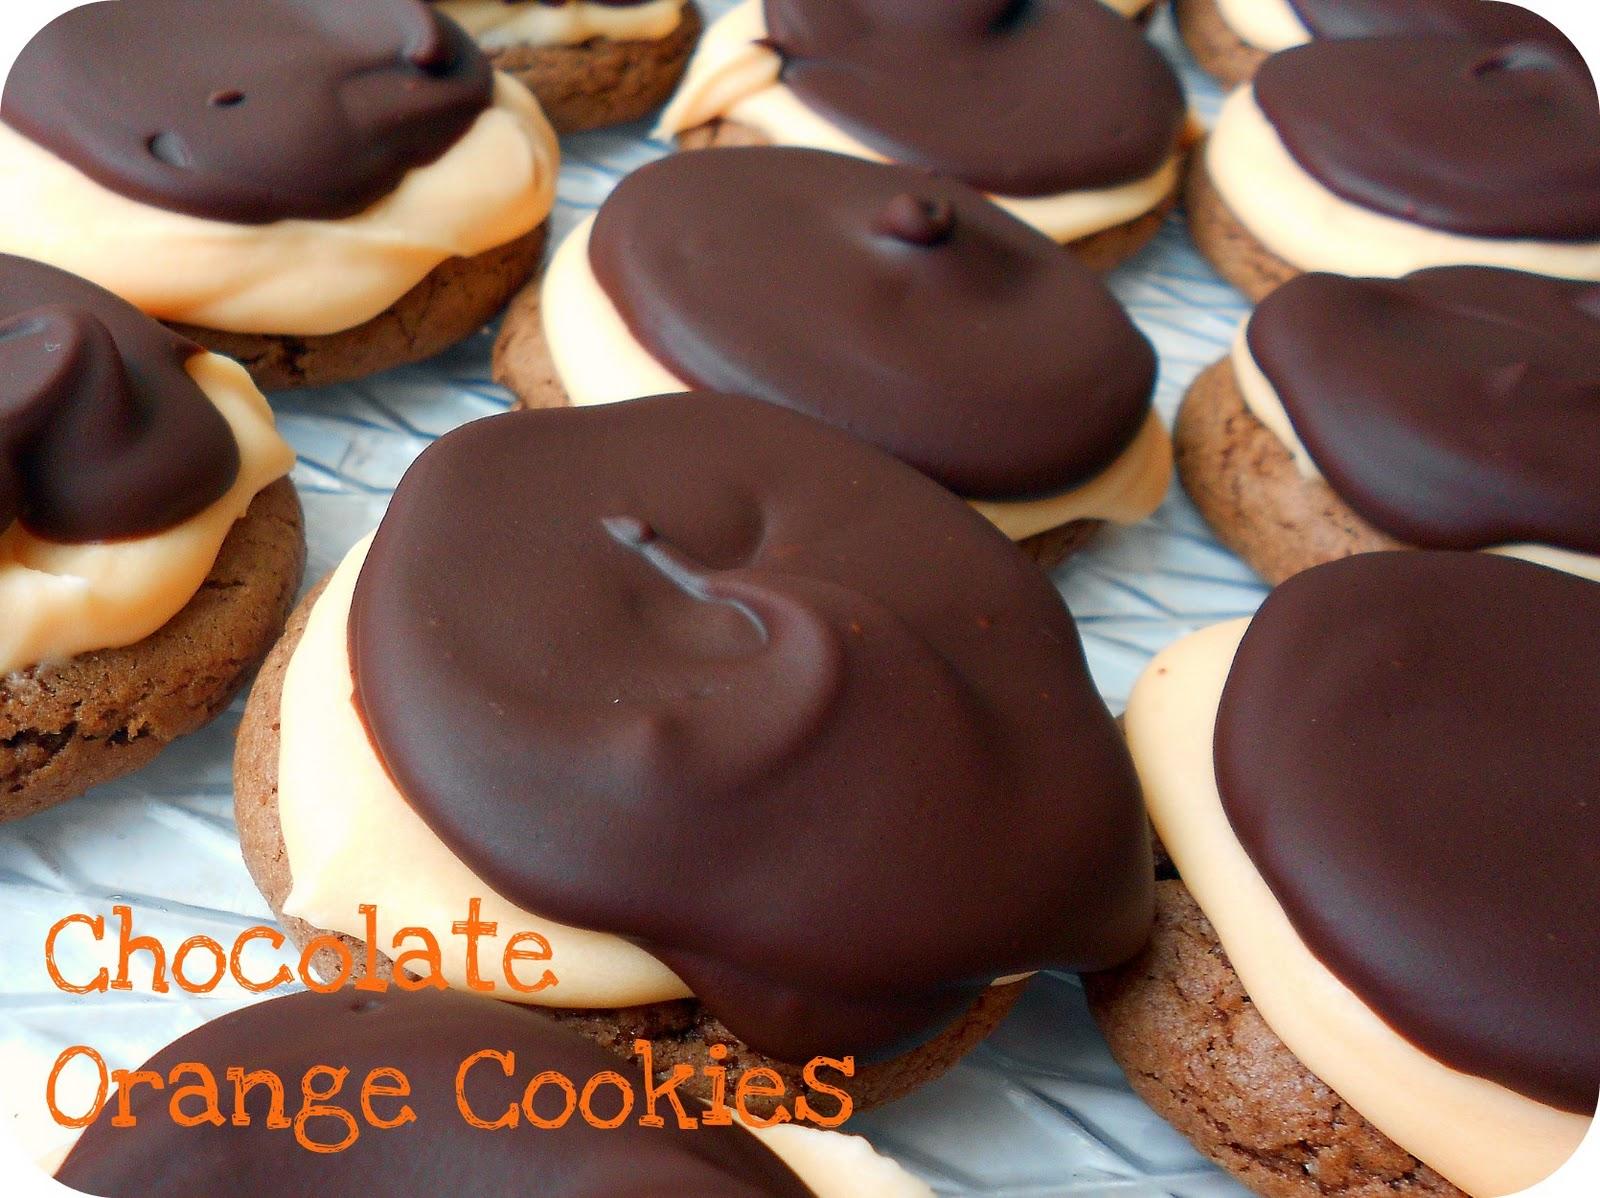 Chocolate Orange Cake Mix Cookies with Ganache Topping ...